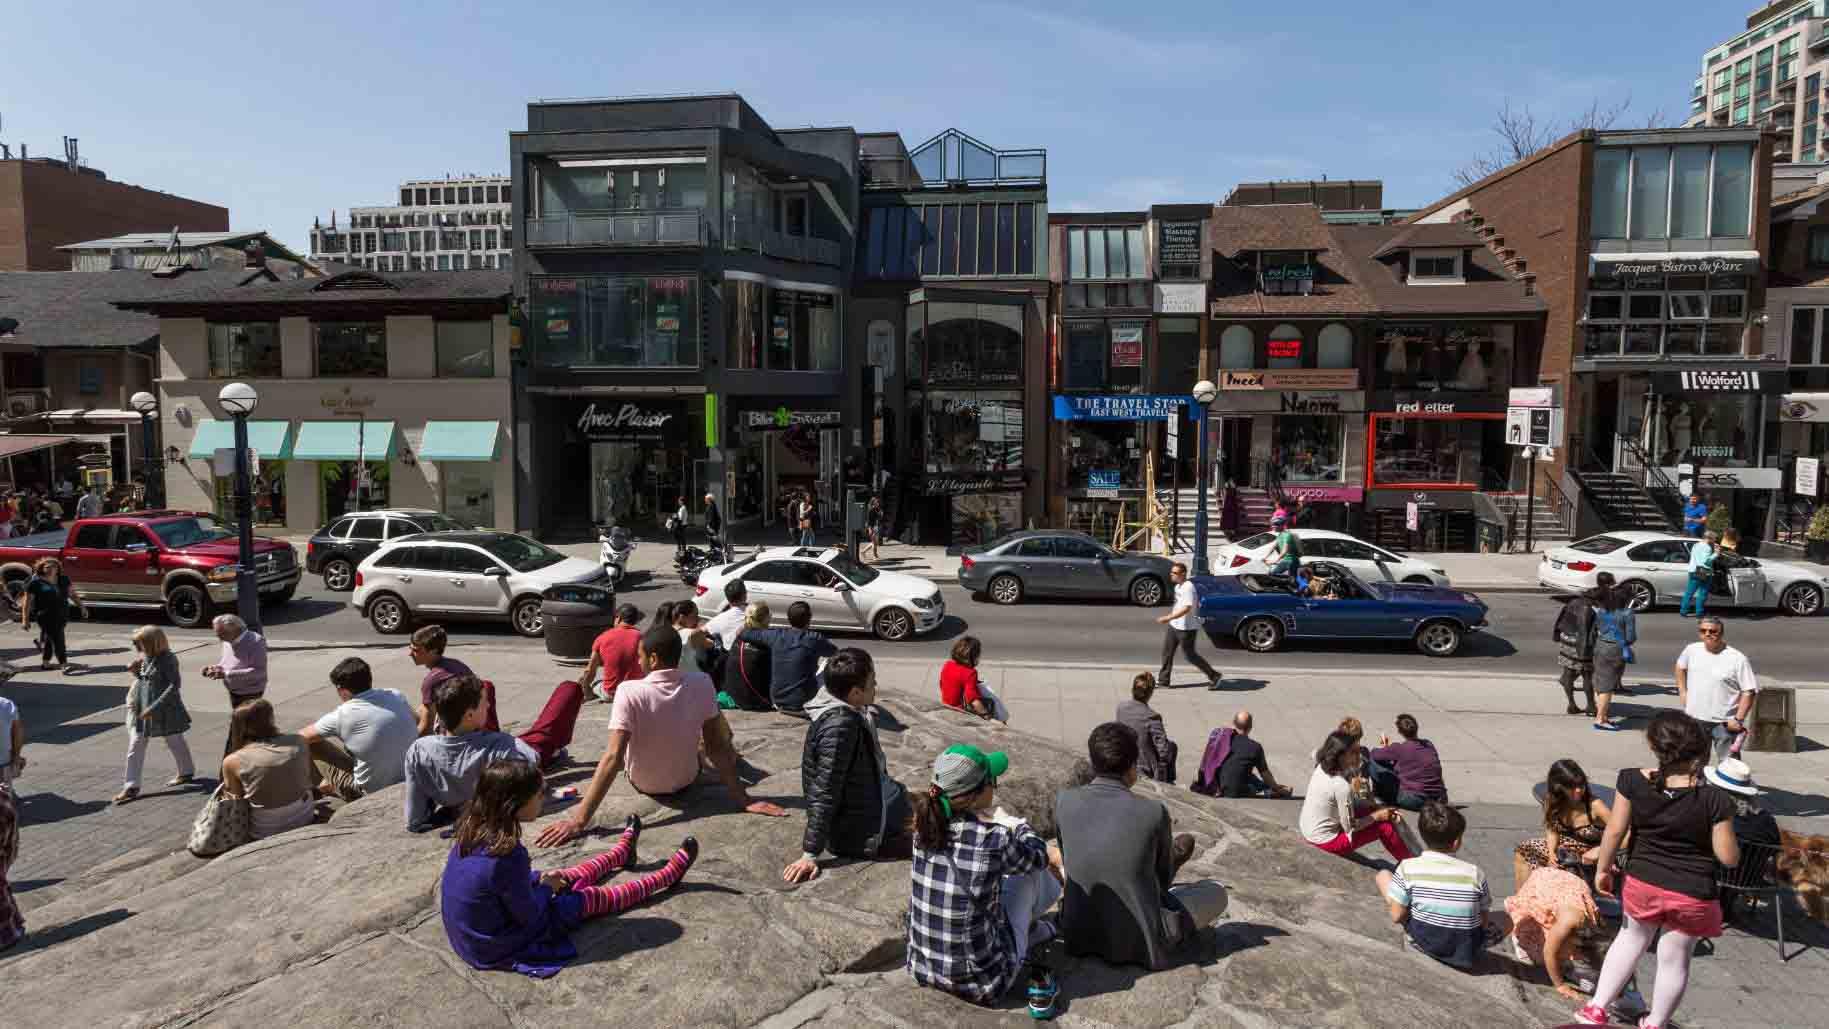 Duncan-Rawlinson-Photo-91760-Shopping-Yorkville-Toronto-Ontario-Canada-20140511-IMG_0986-The-Rock-At-Yorkville-Park